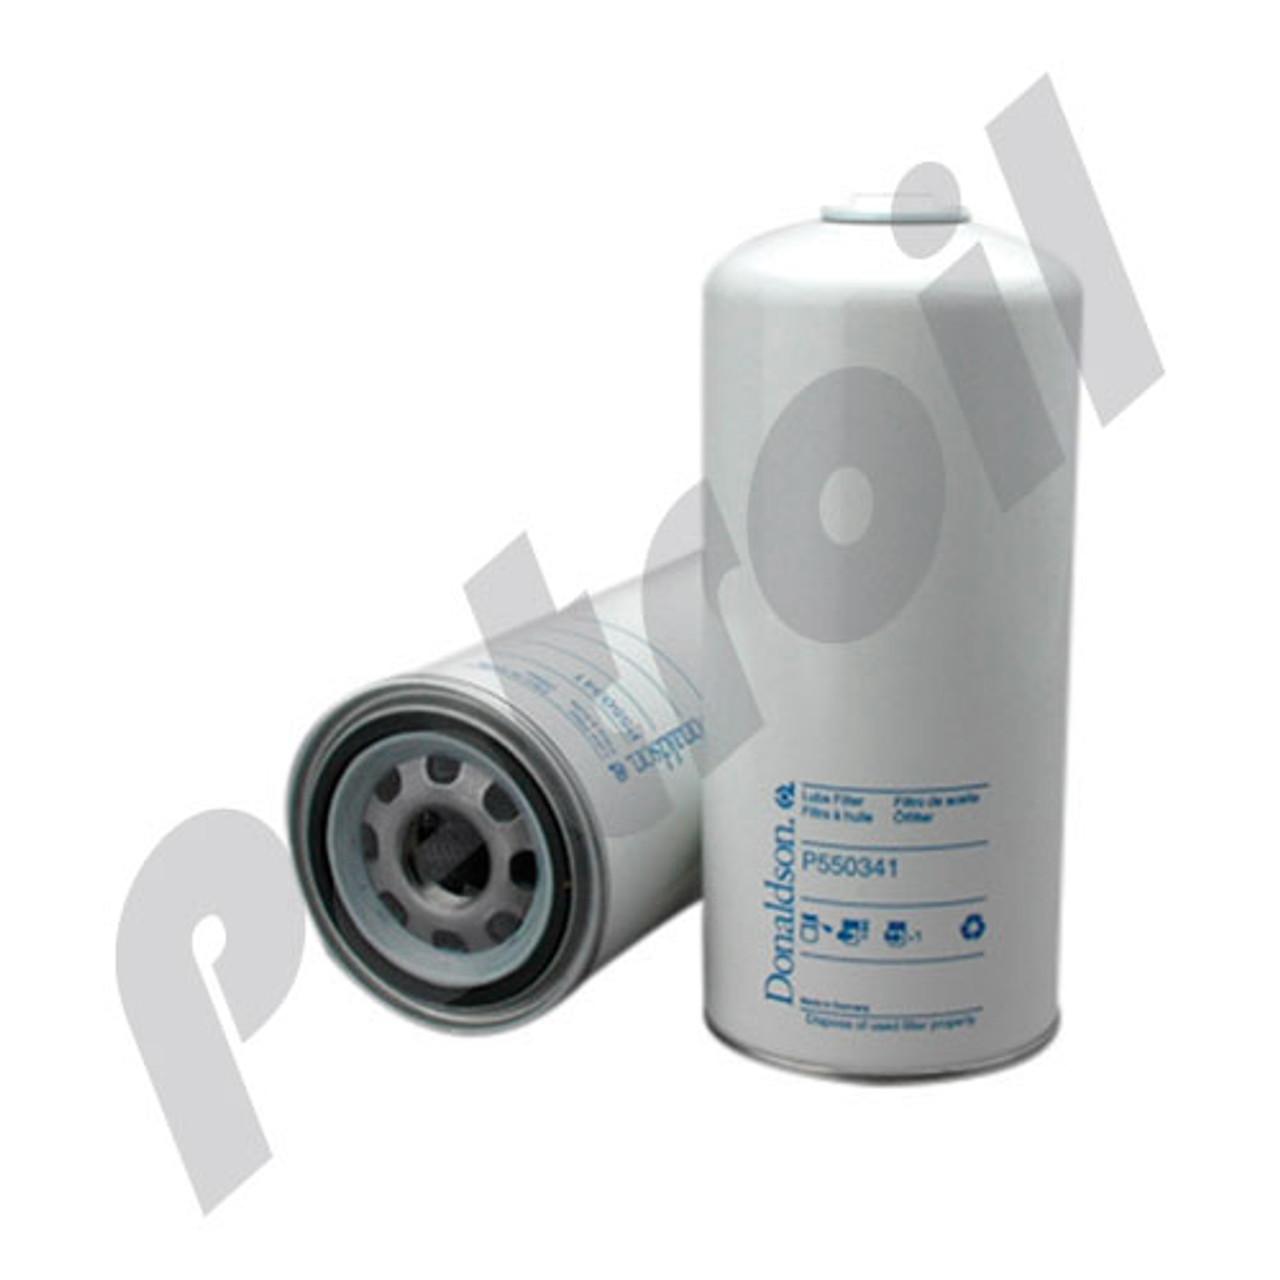 Donaldson P553712 Filter Donaldson Company Inc kfP553712